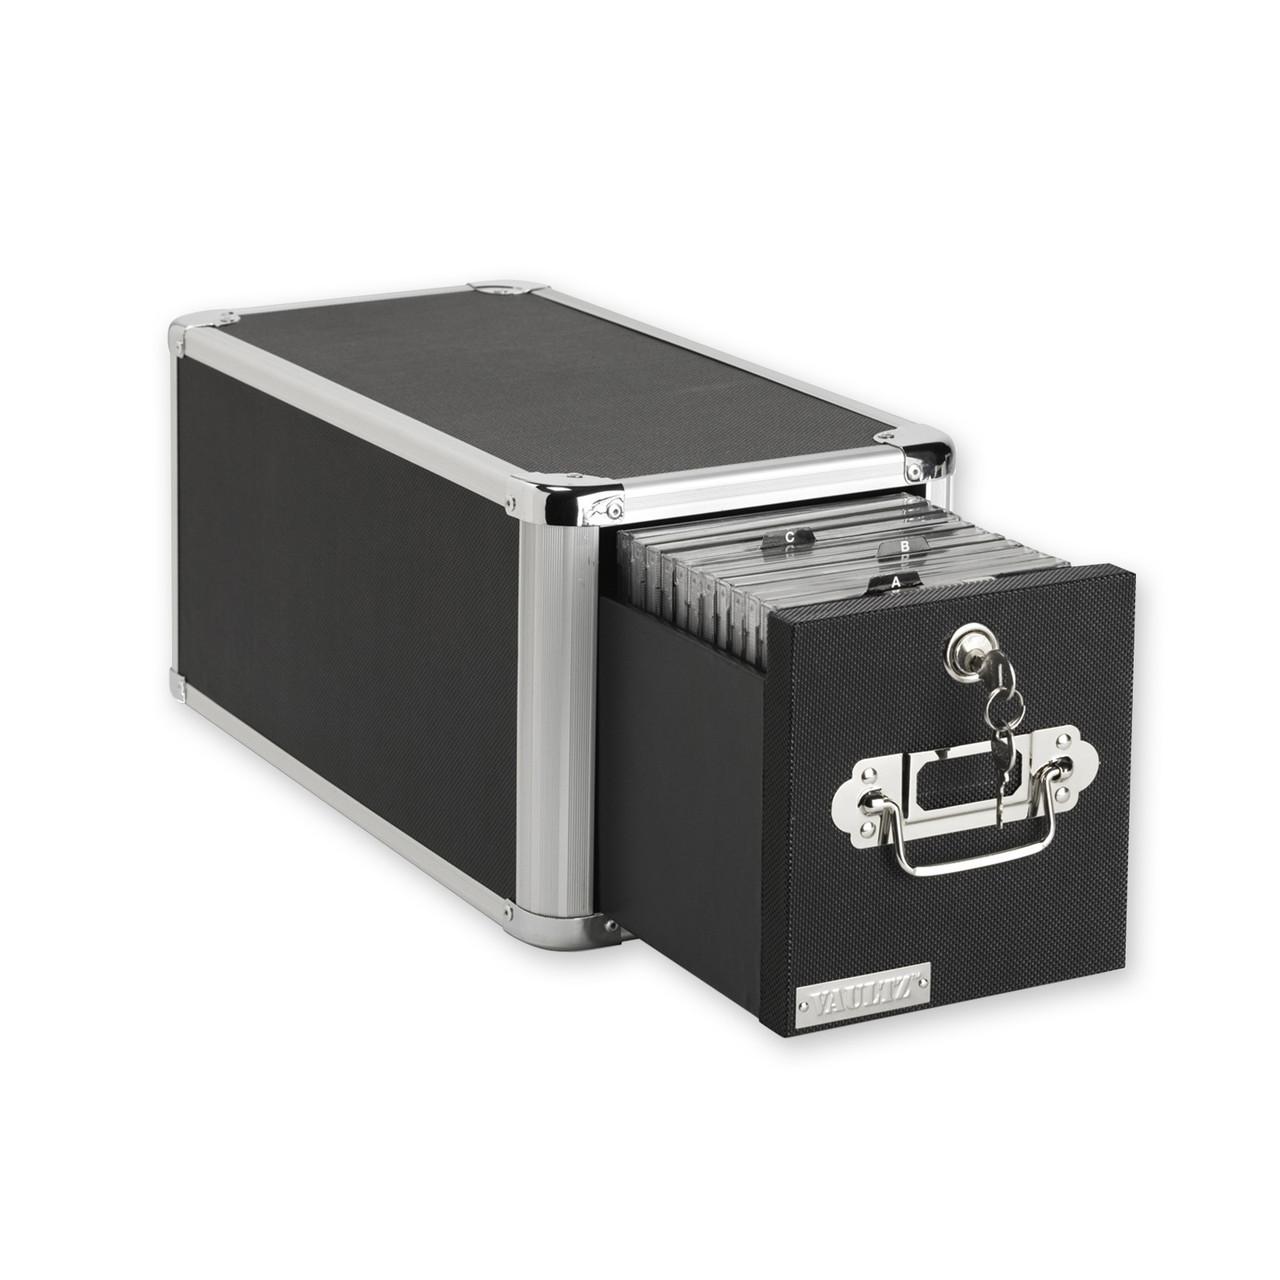 Locking Single Drawer Cd File Cabinet Black Vaultz Vz01173